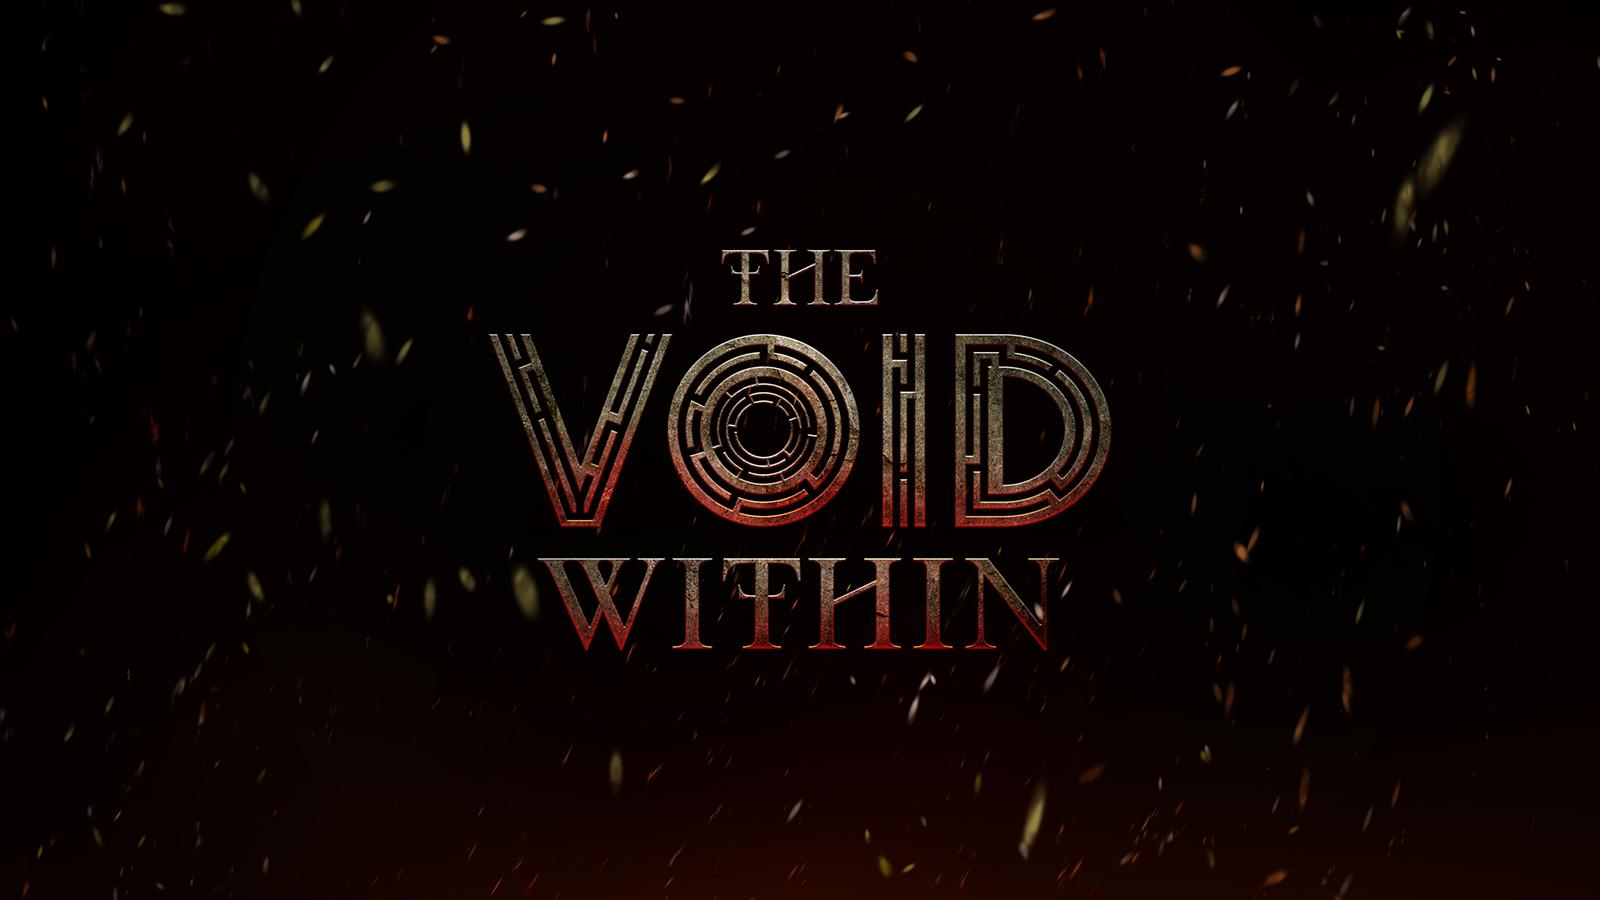 The Void Within Logo Screen Wallpaper.jpg